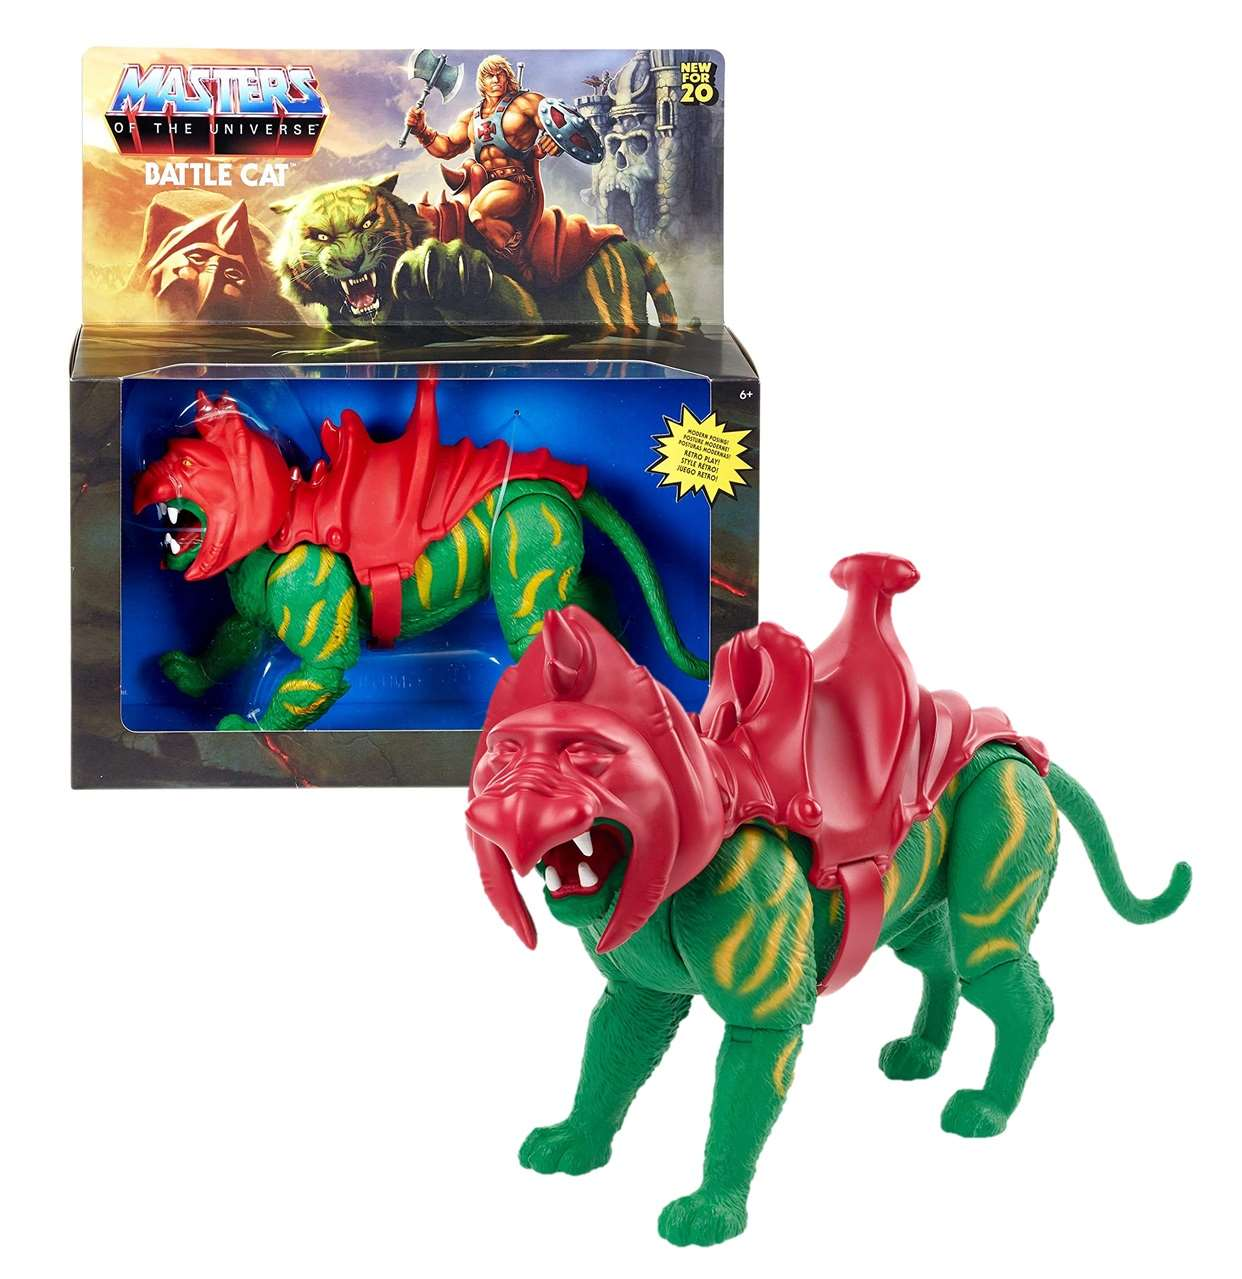 Battle Cat Retro Play Figura Masters Of The Universe 6 PuLG